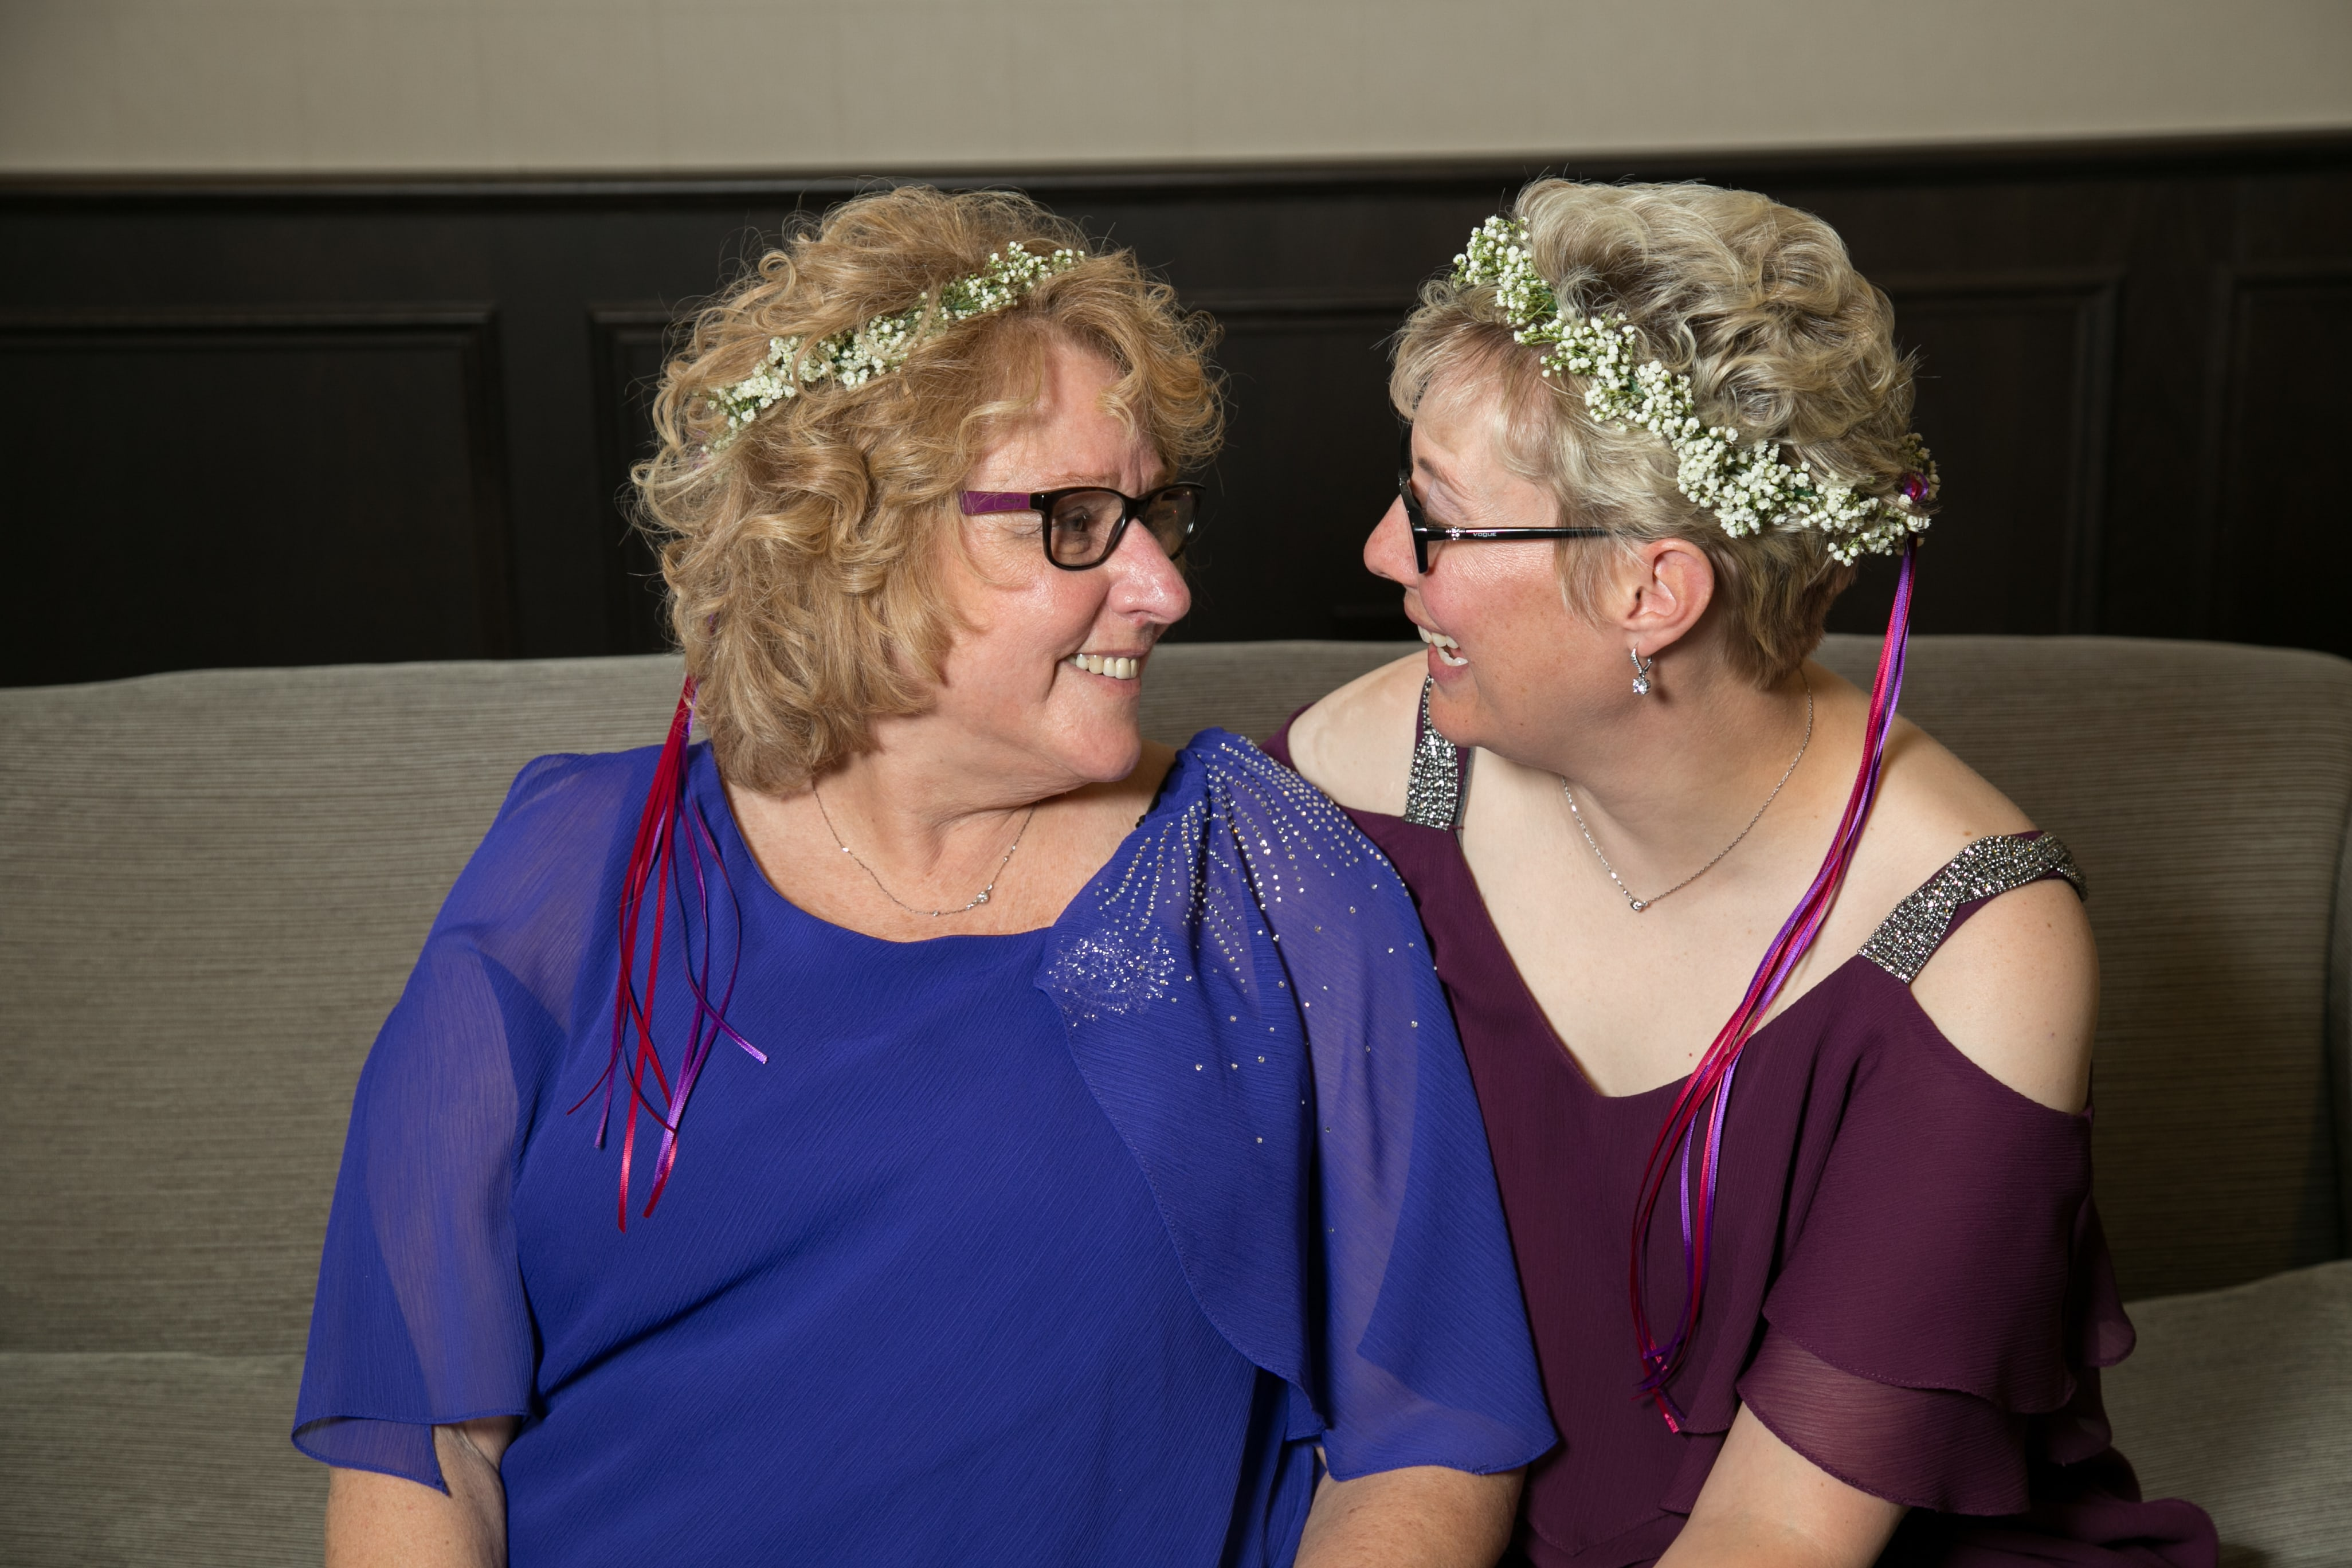 LGBT Couple on Wedding Day